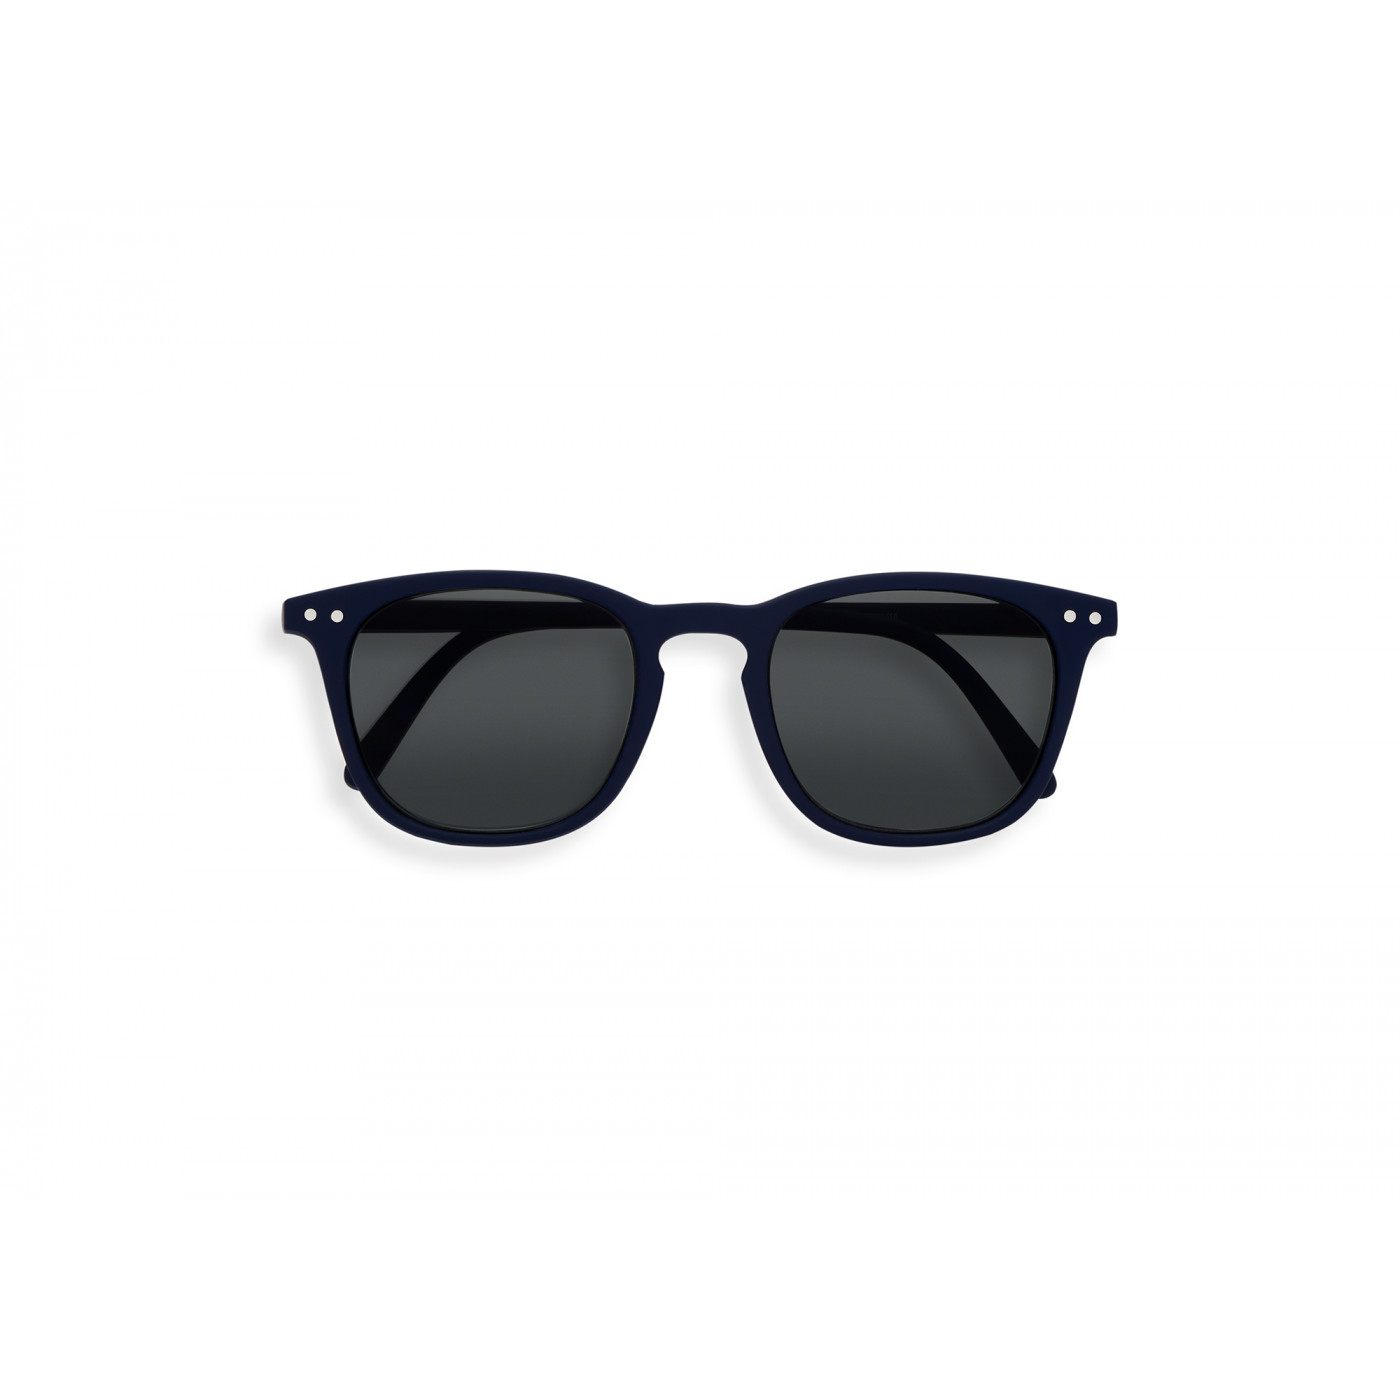 IZIPIZI brille #E SUN JUNIOR Navy Blue